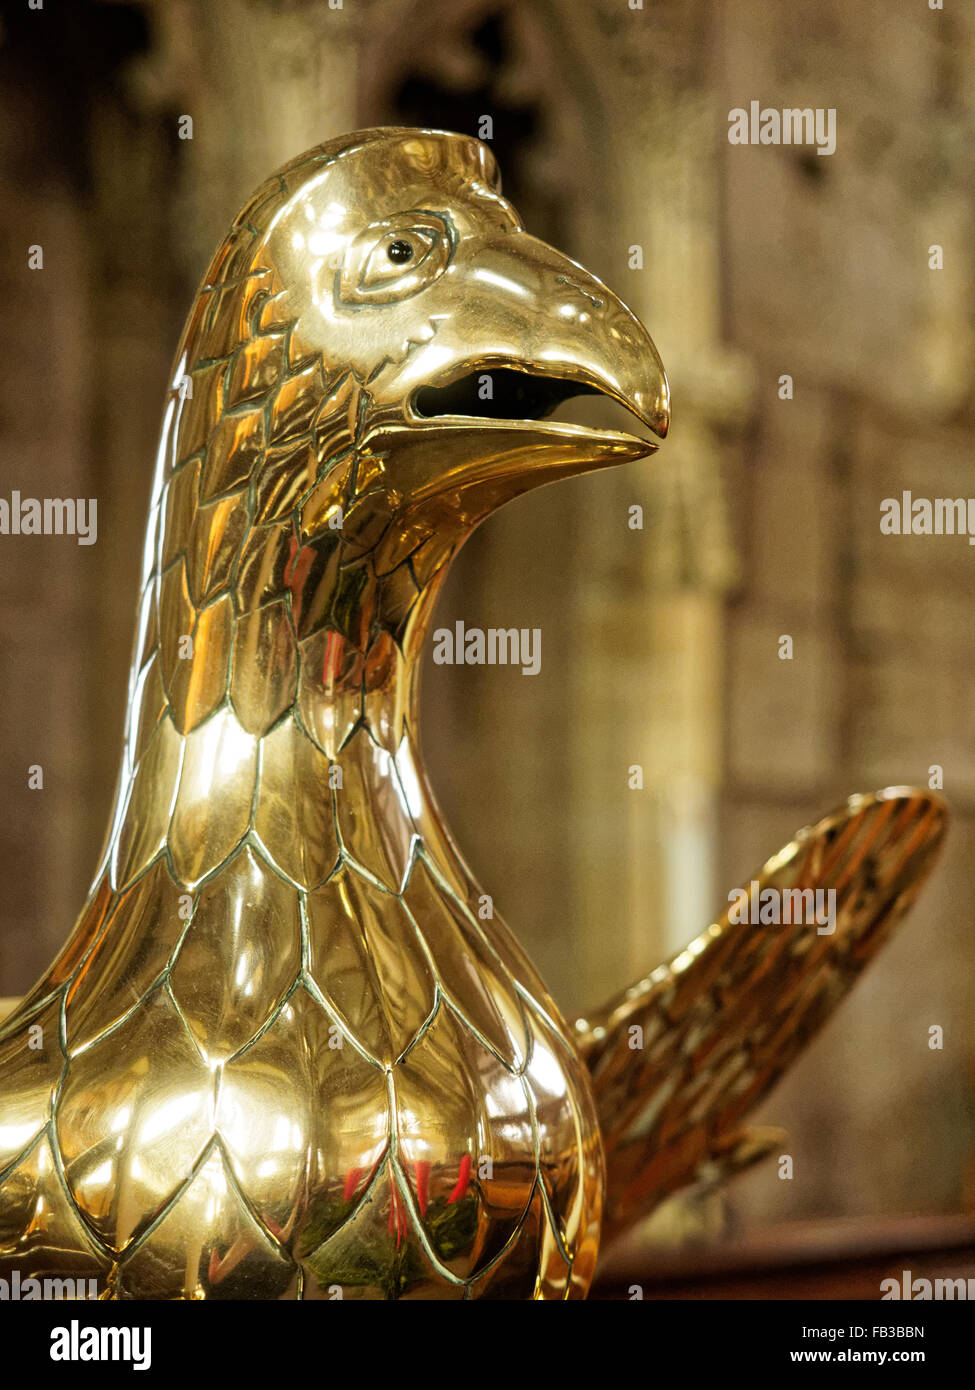 Brass Lectern - Stock Image